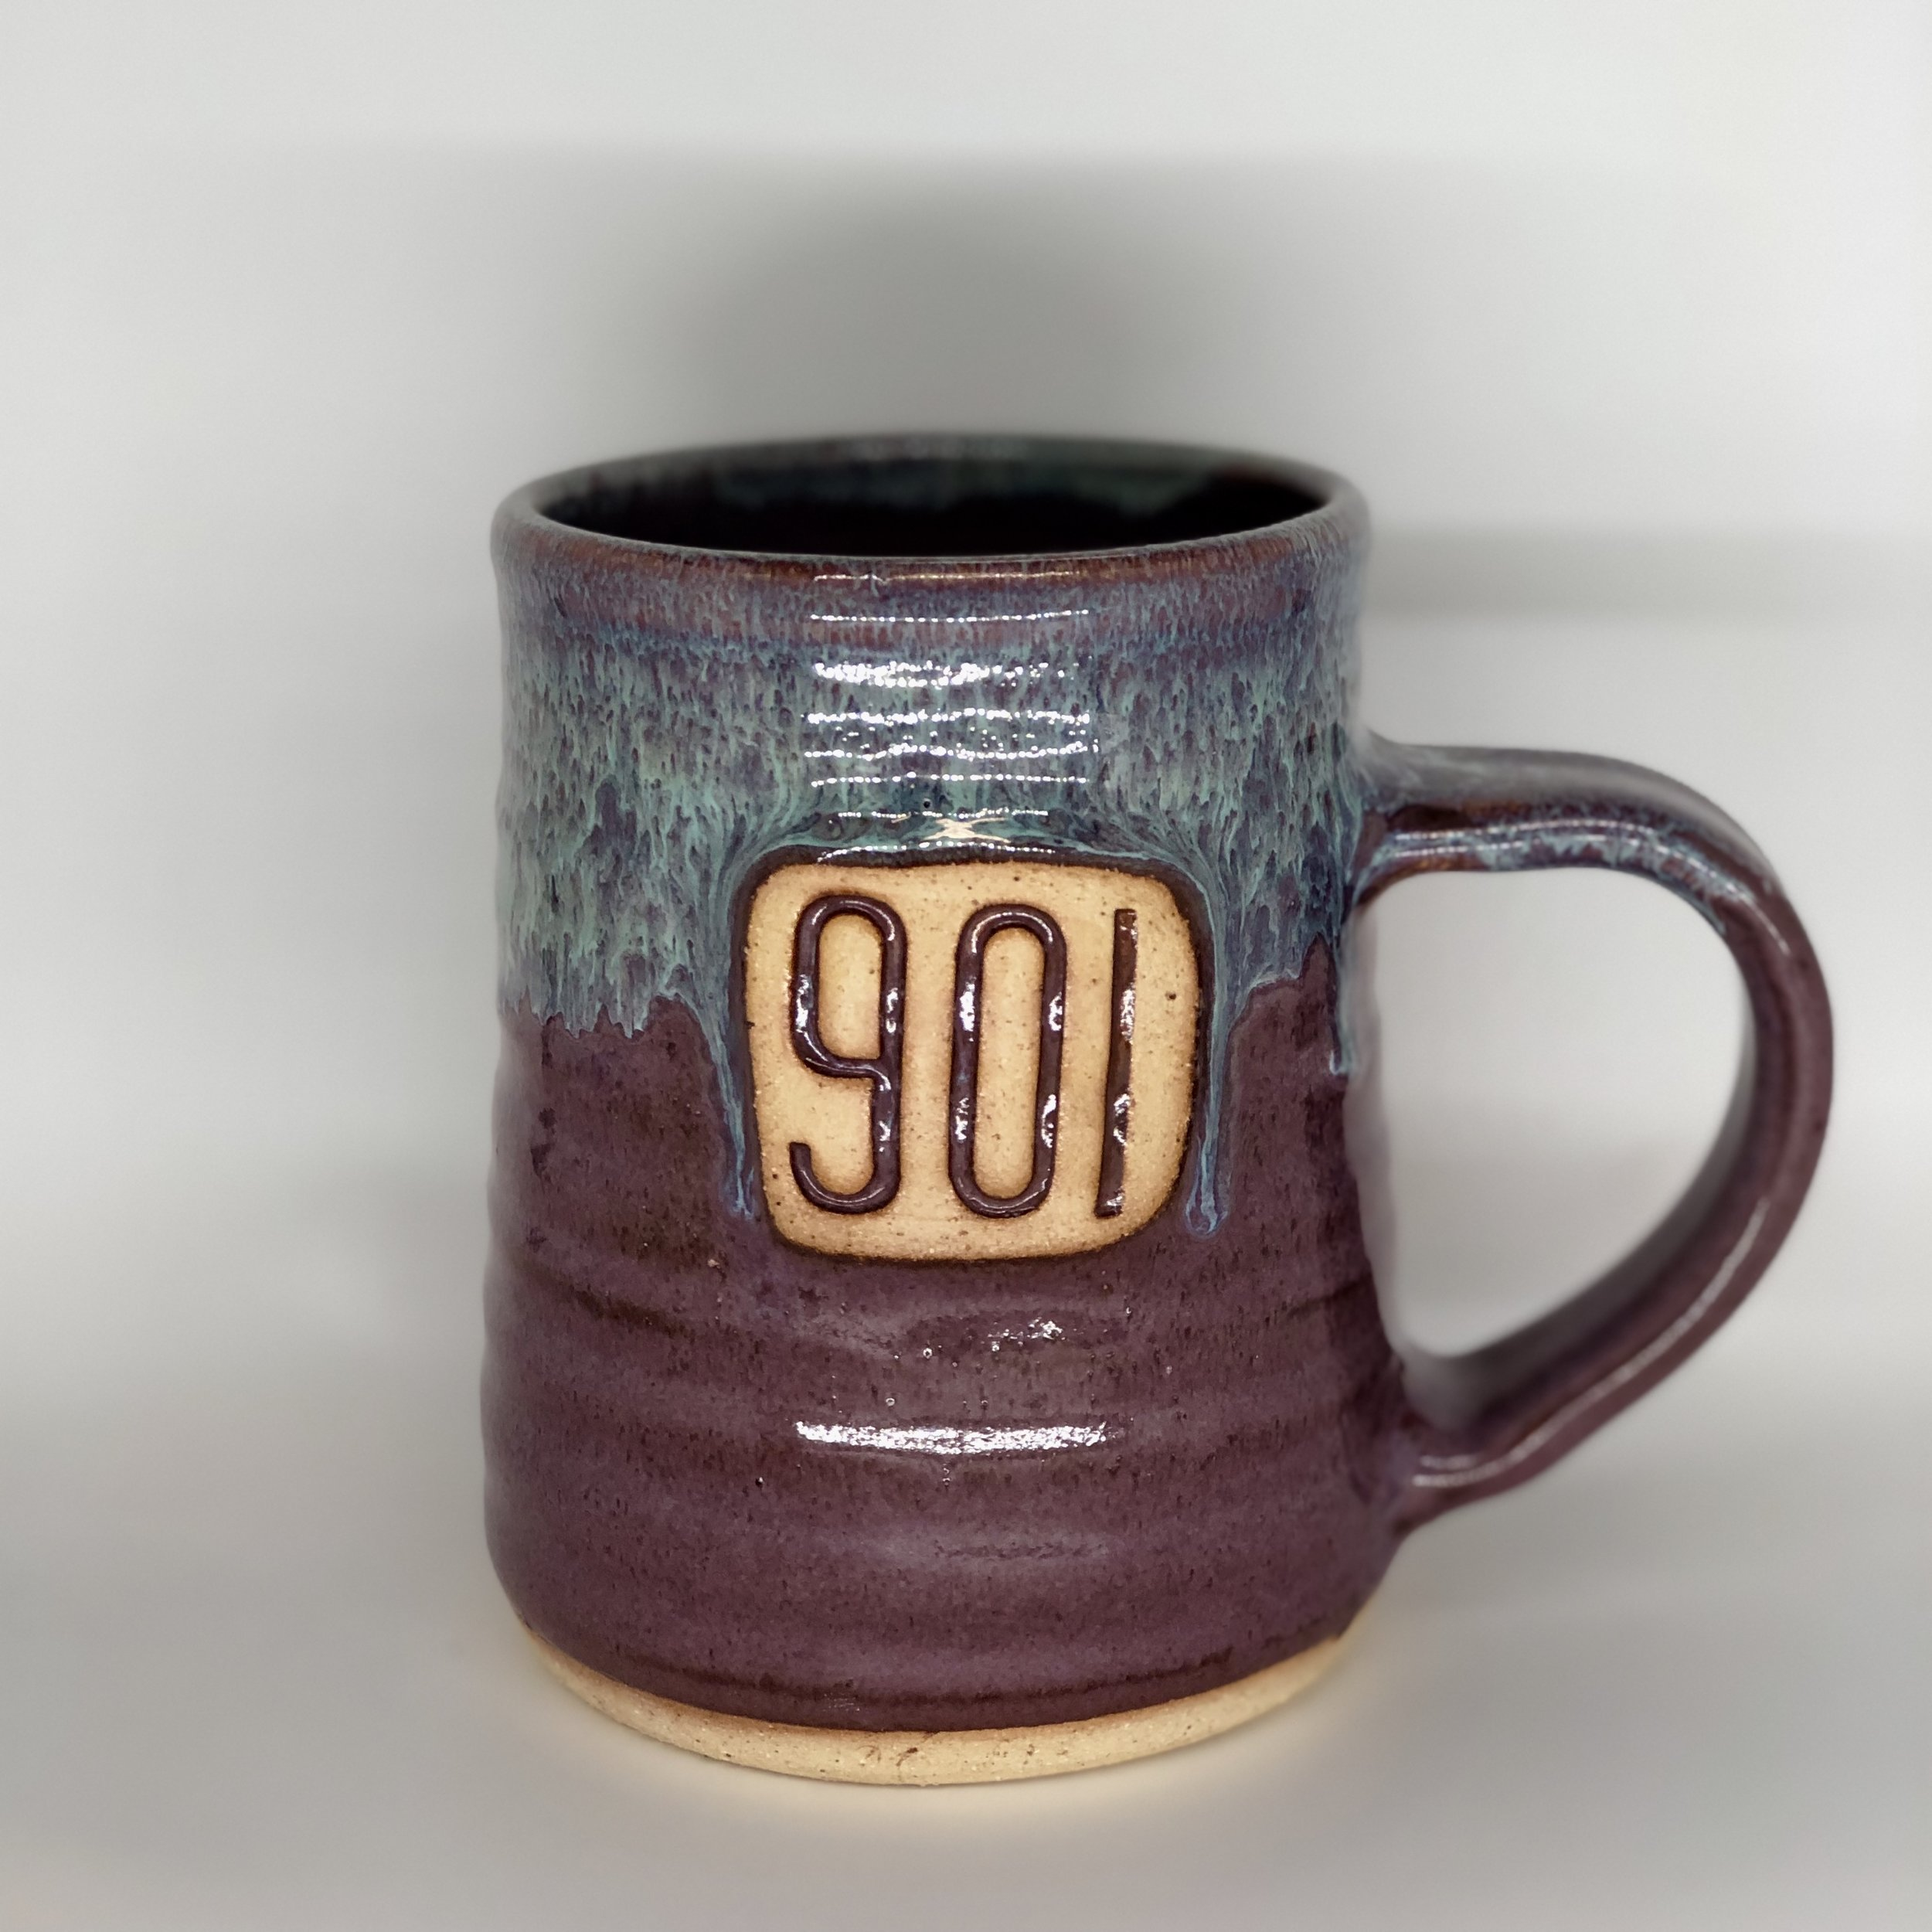 901 Mug, Tall Shape, Purple / Blue Color